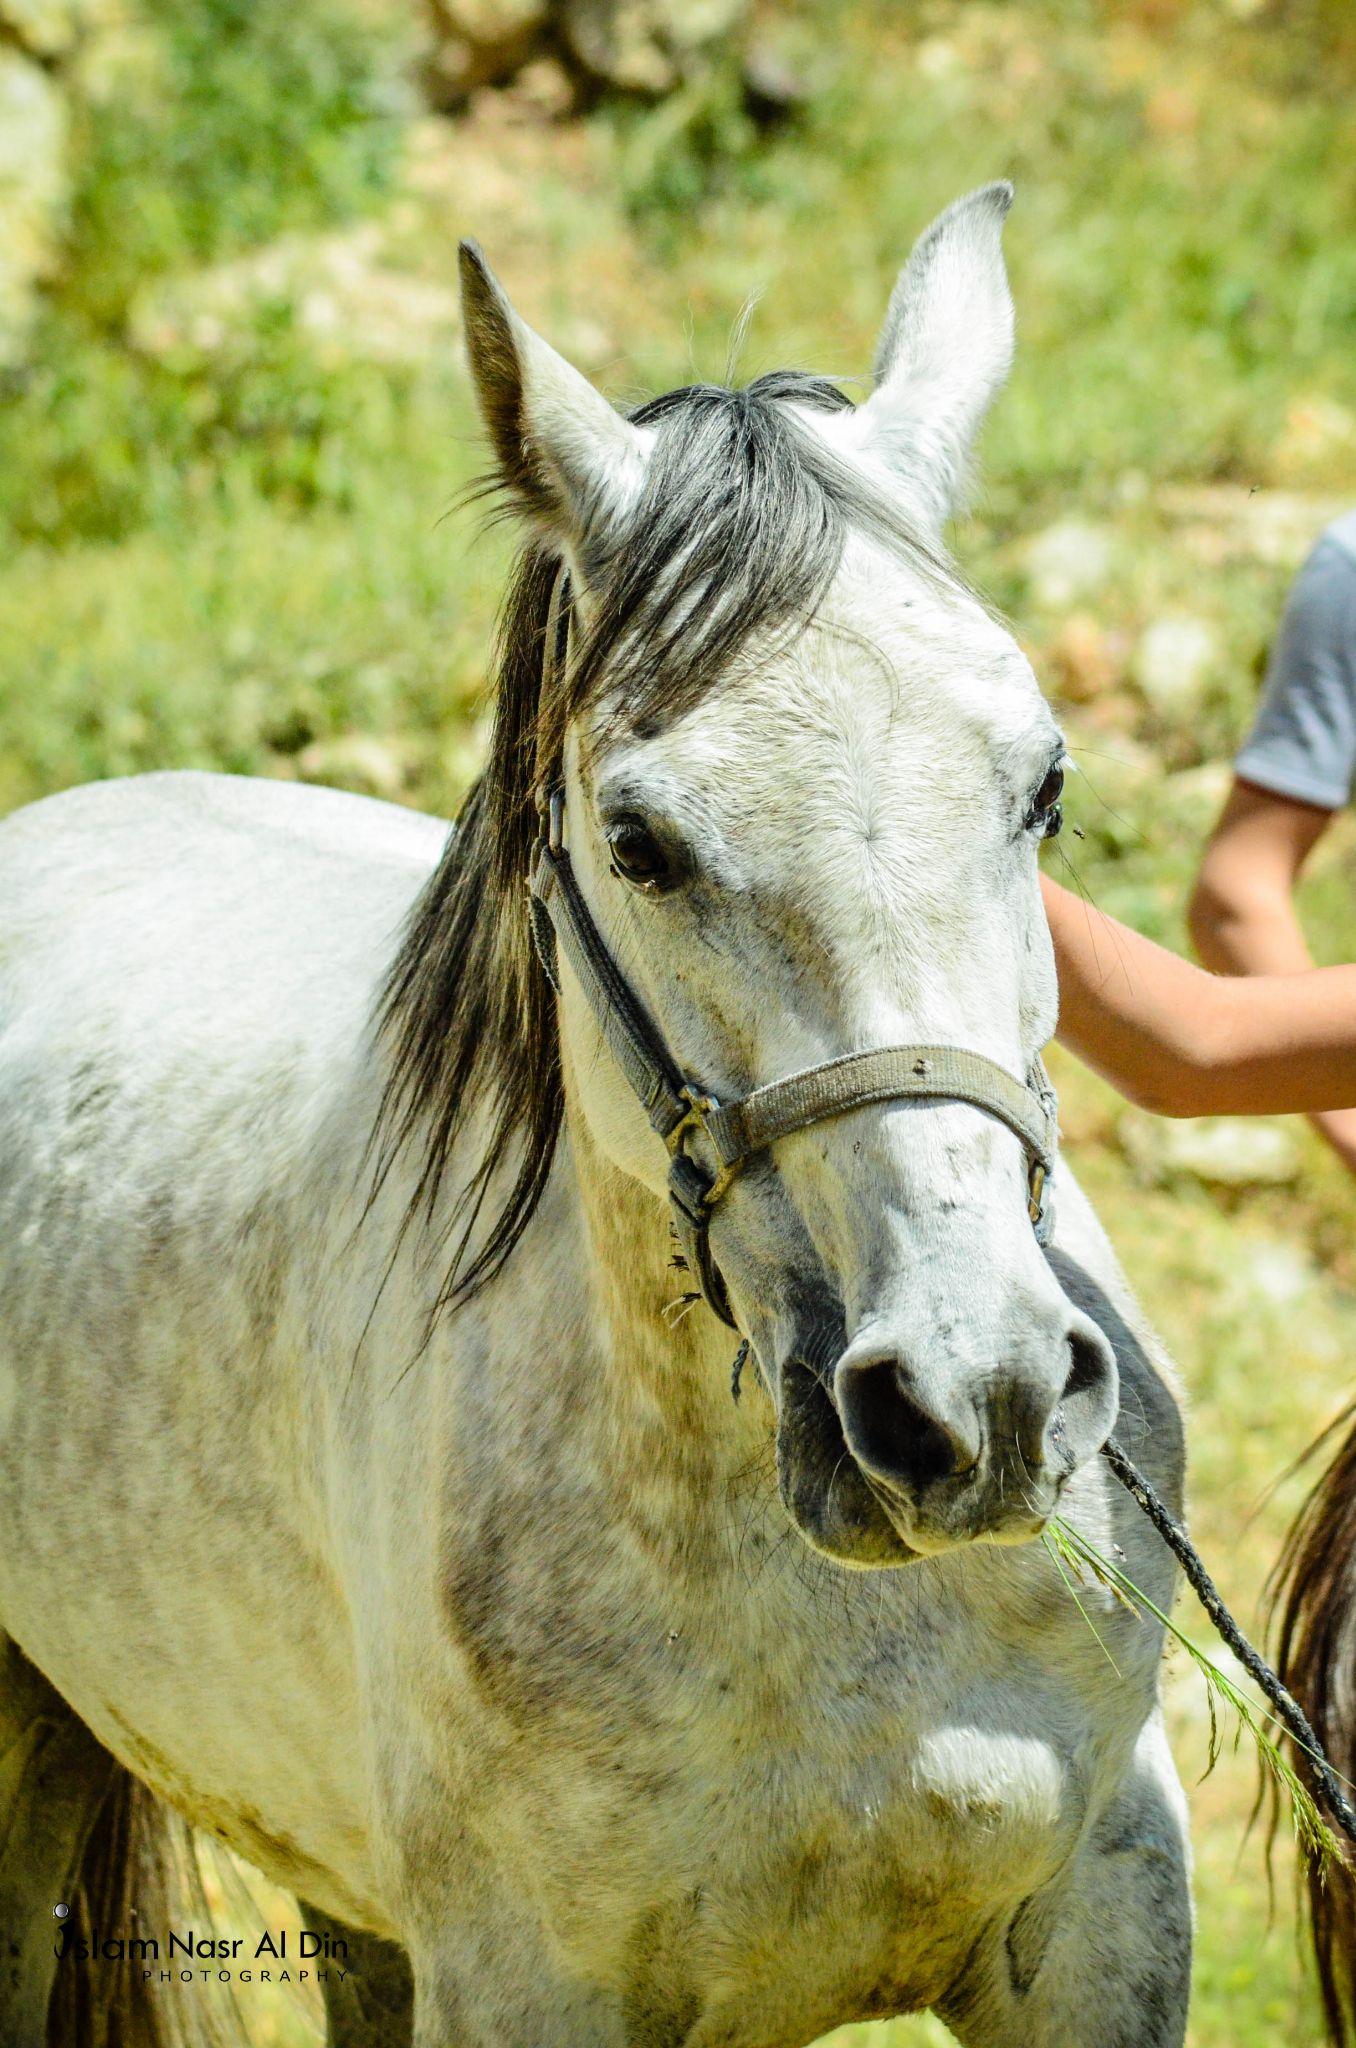 My horse by islam naser alden